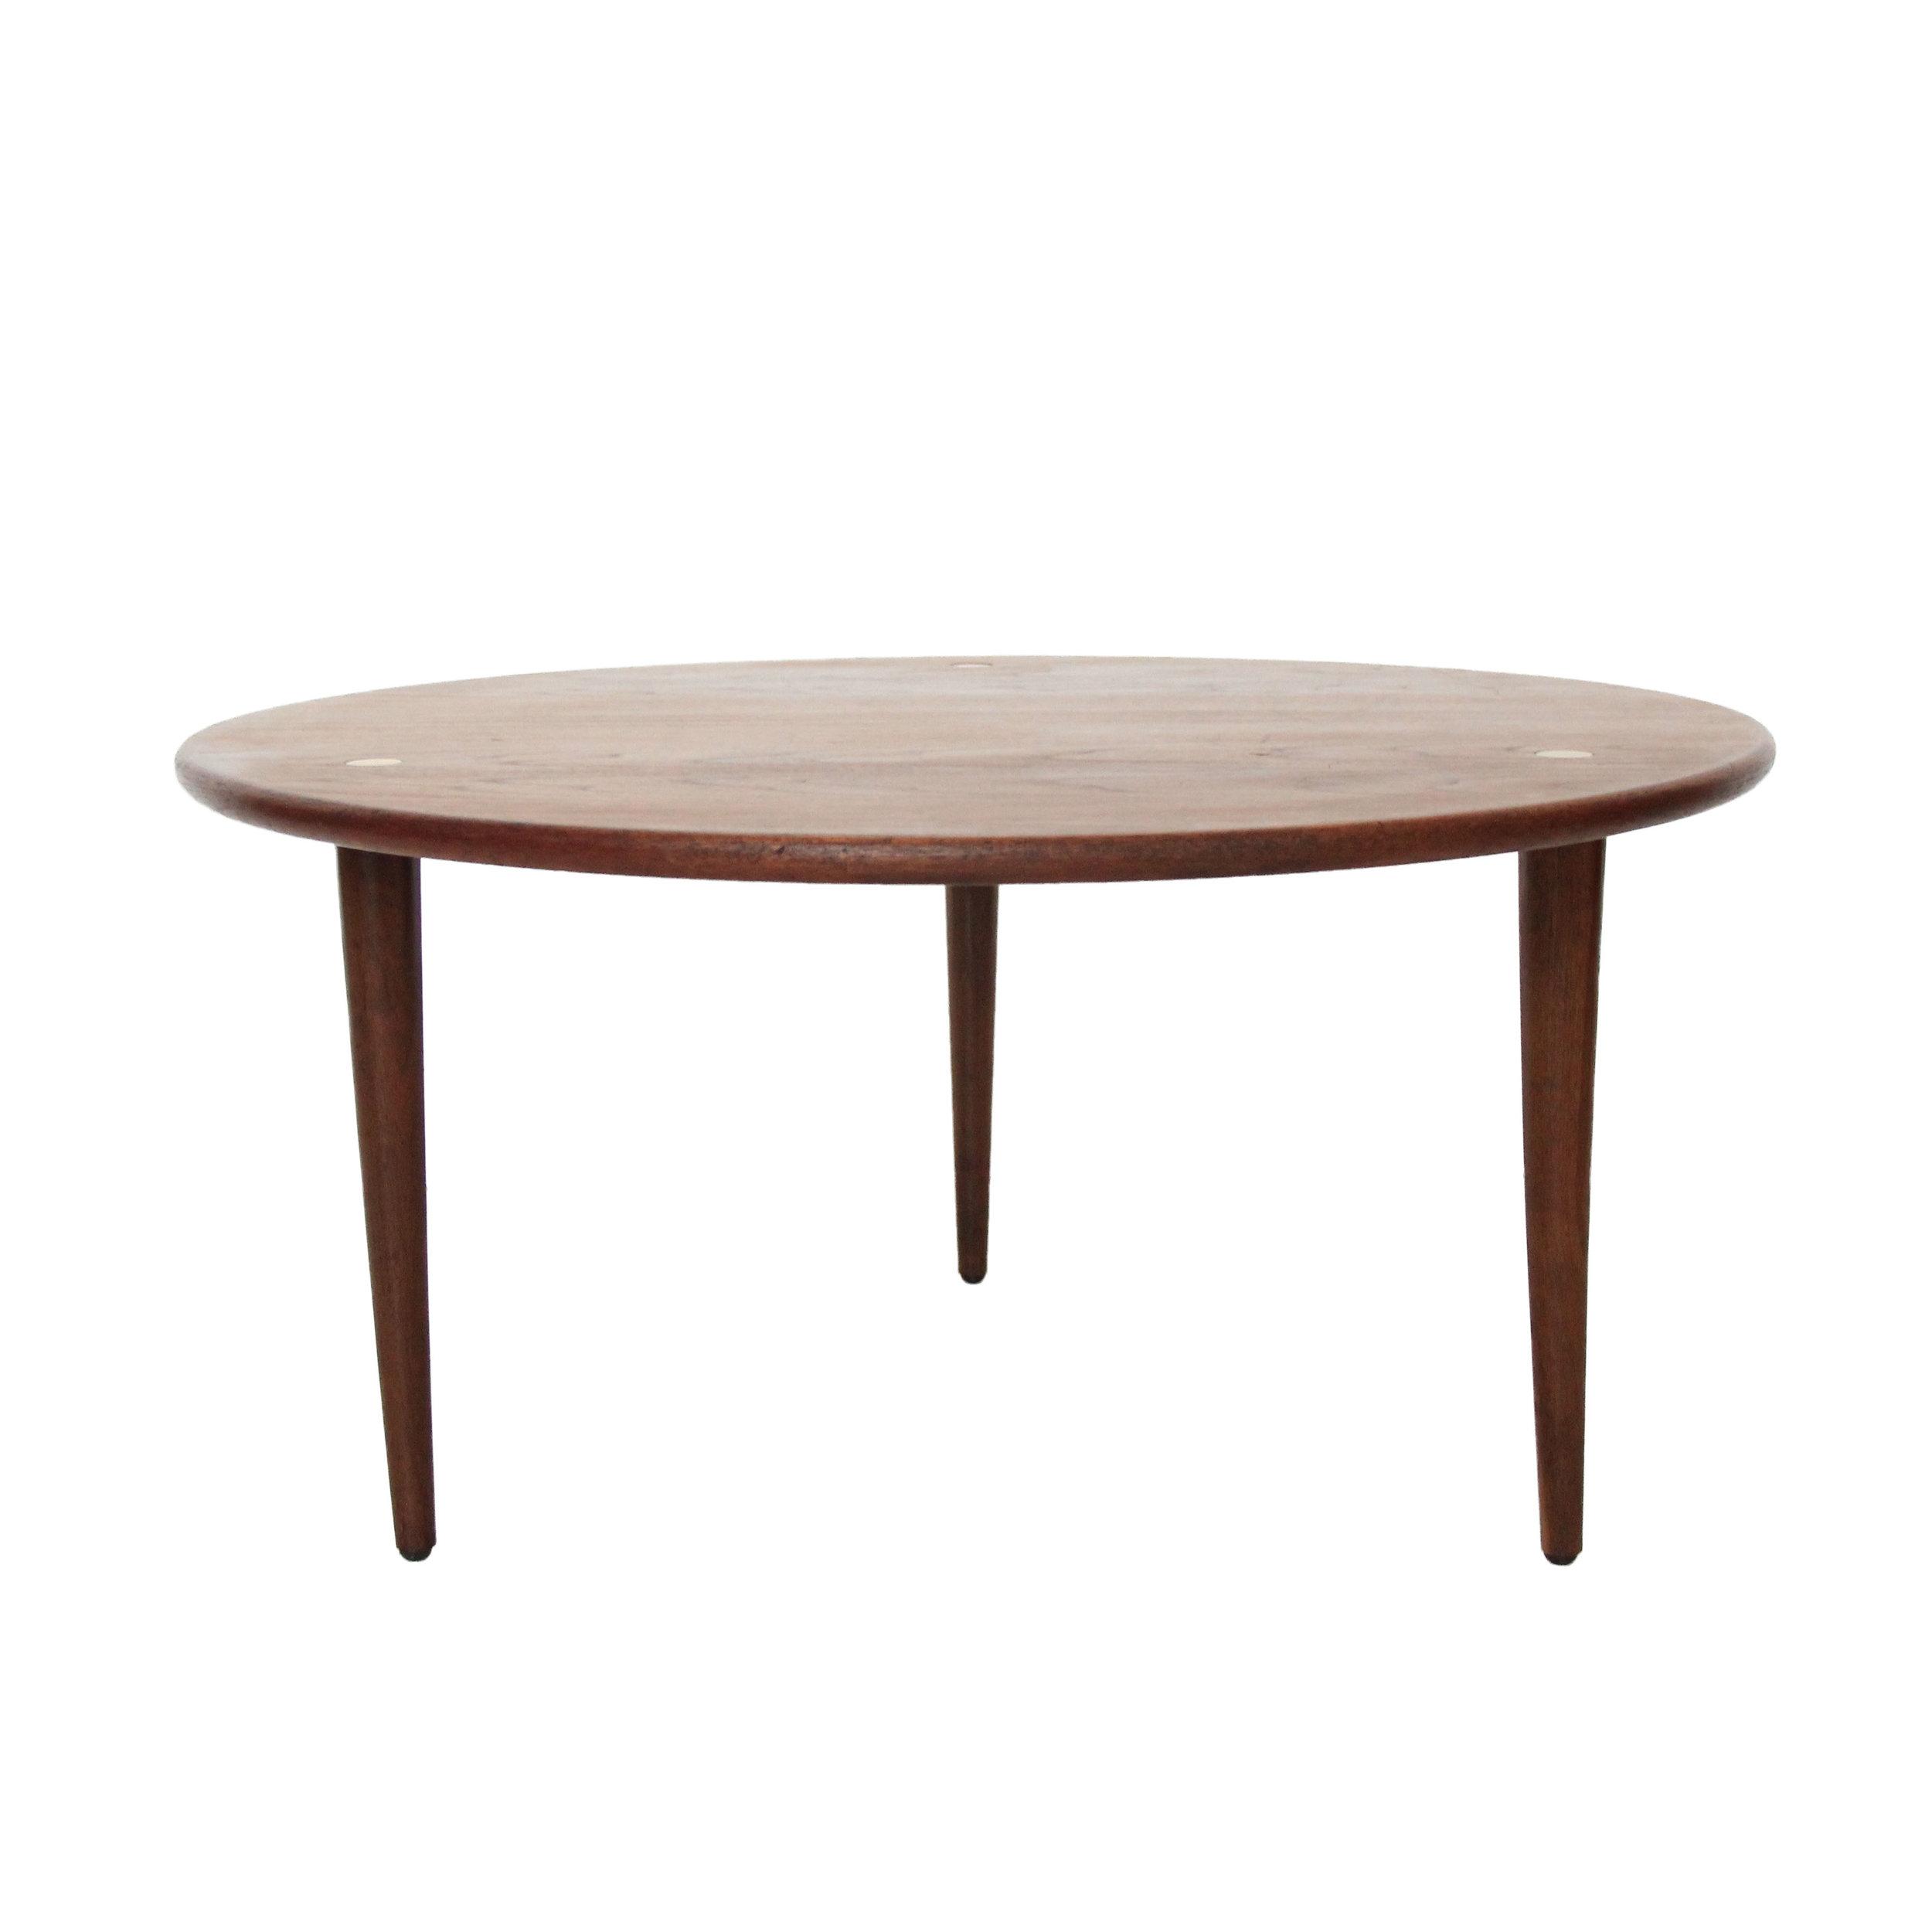 Vintage Mid Century Modern DUX Coffee Table